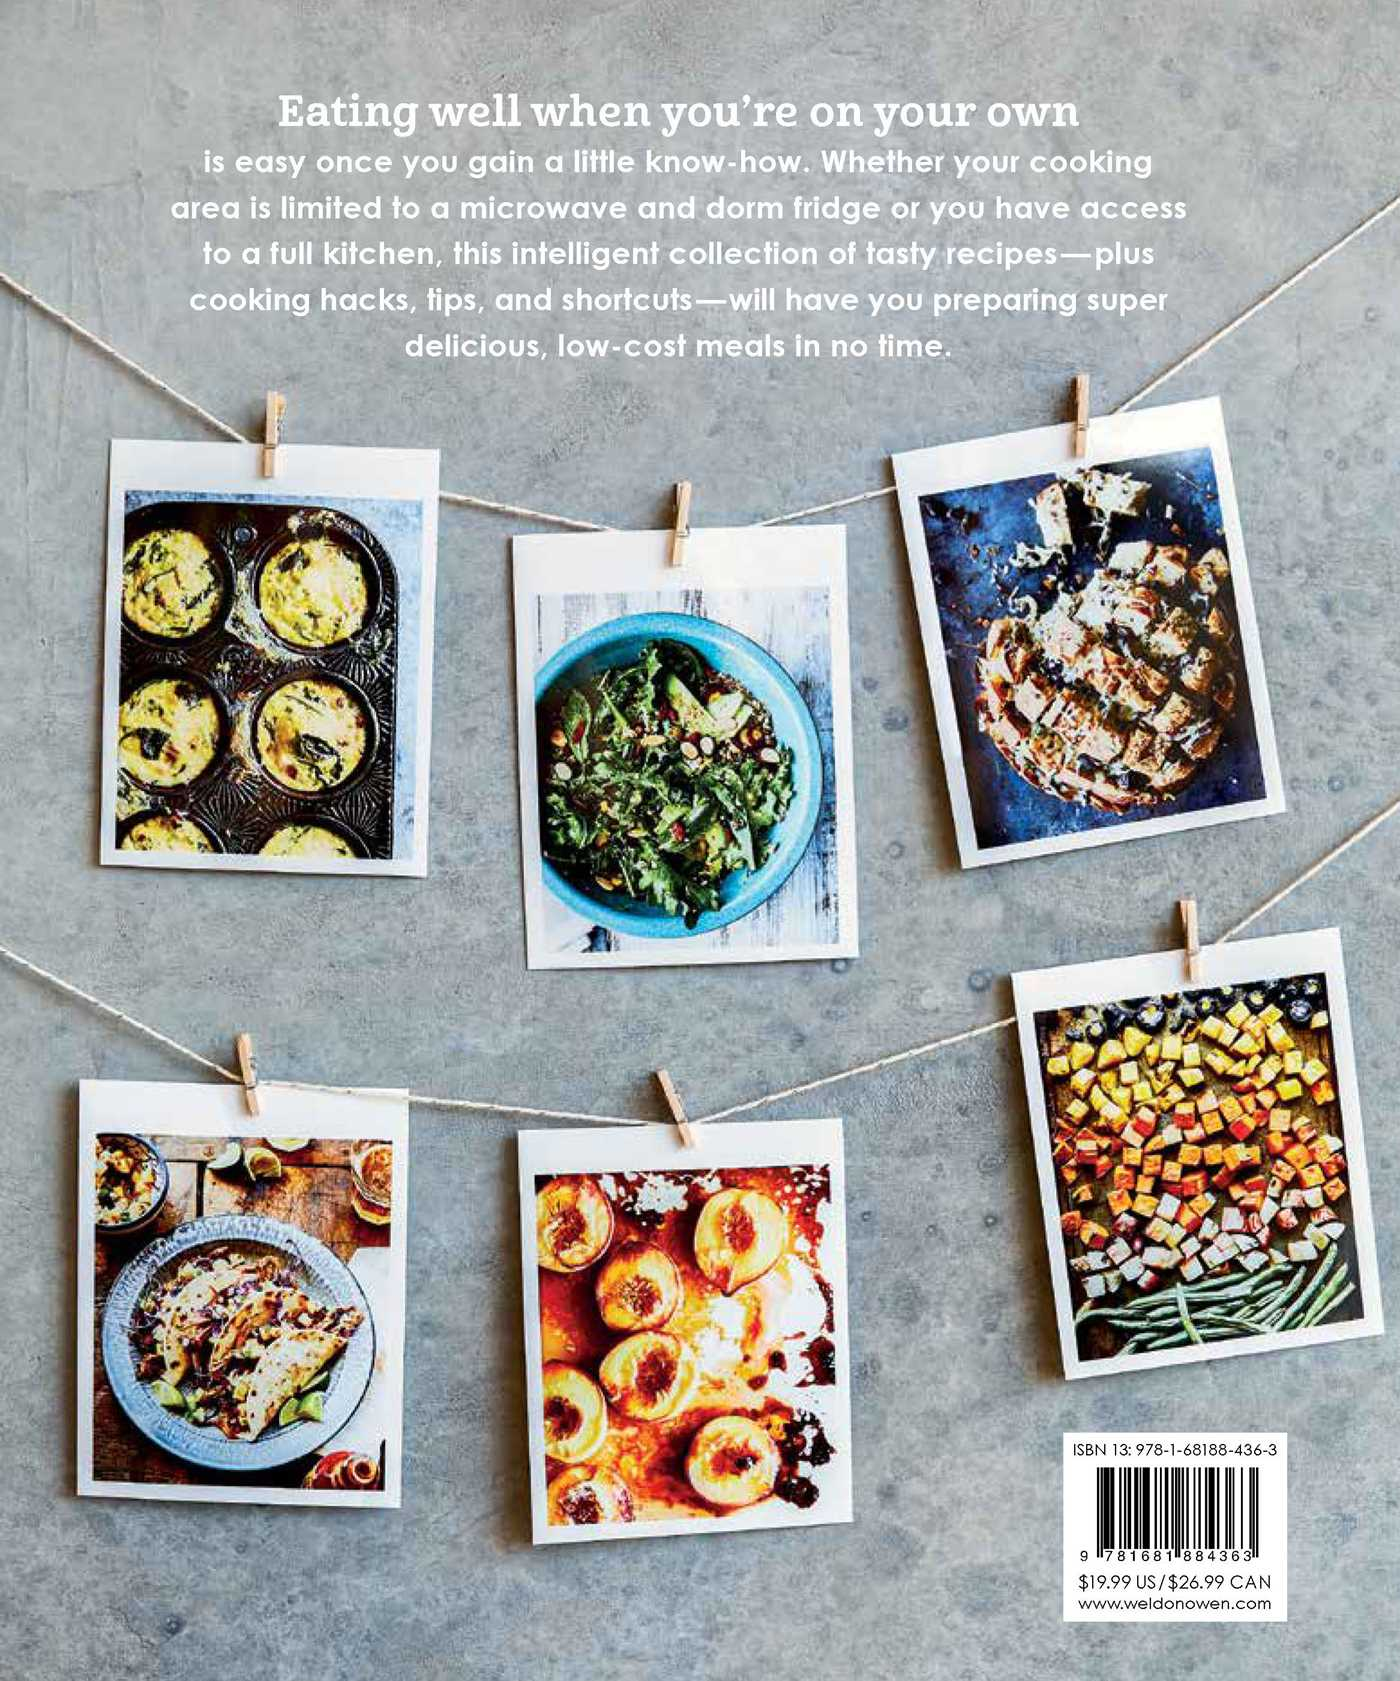 The college cookbook 9781681884363 hr back